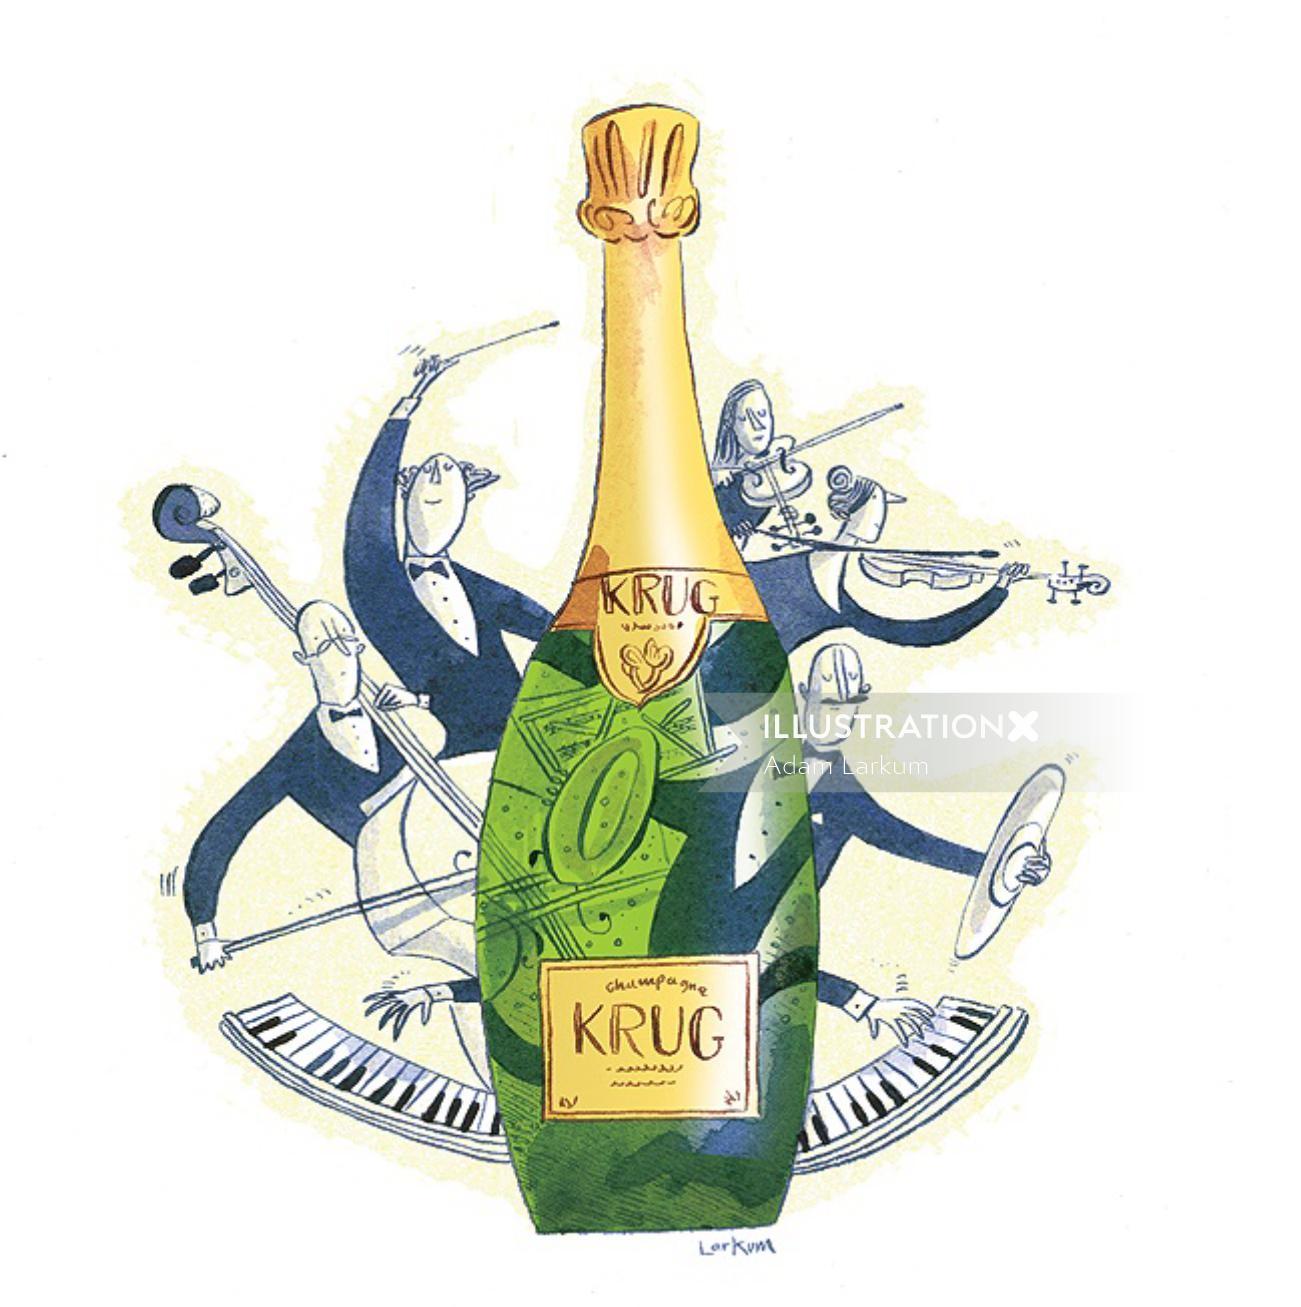 Saturday Telegraph kurg wine section illustration